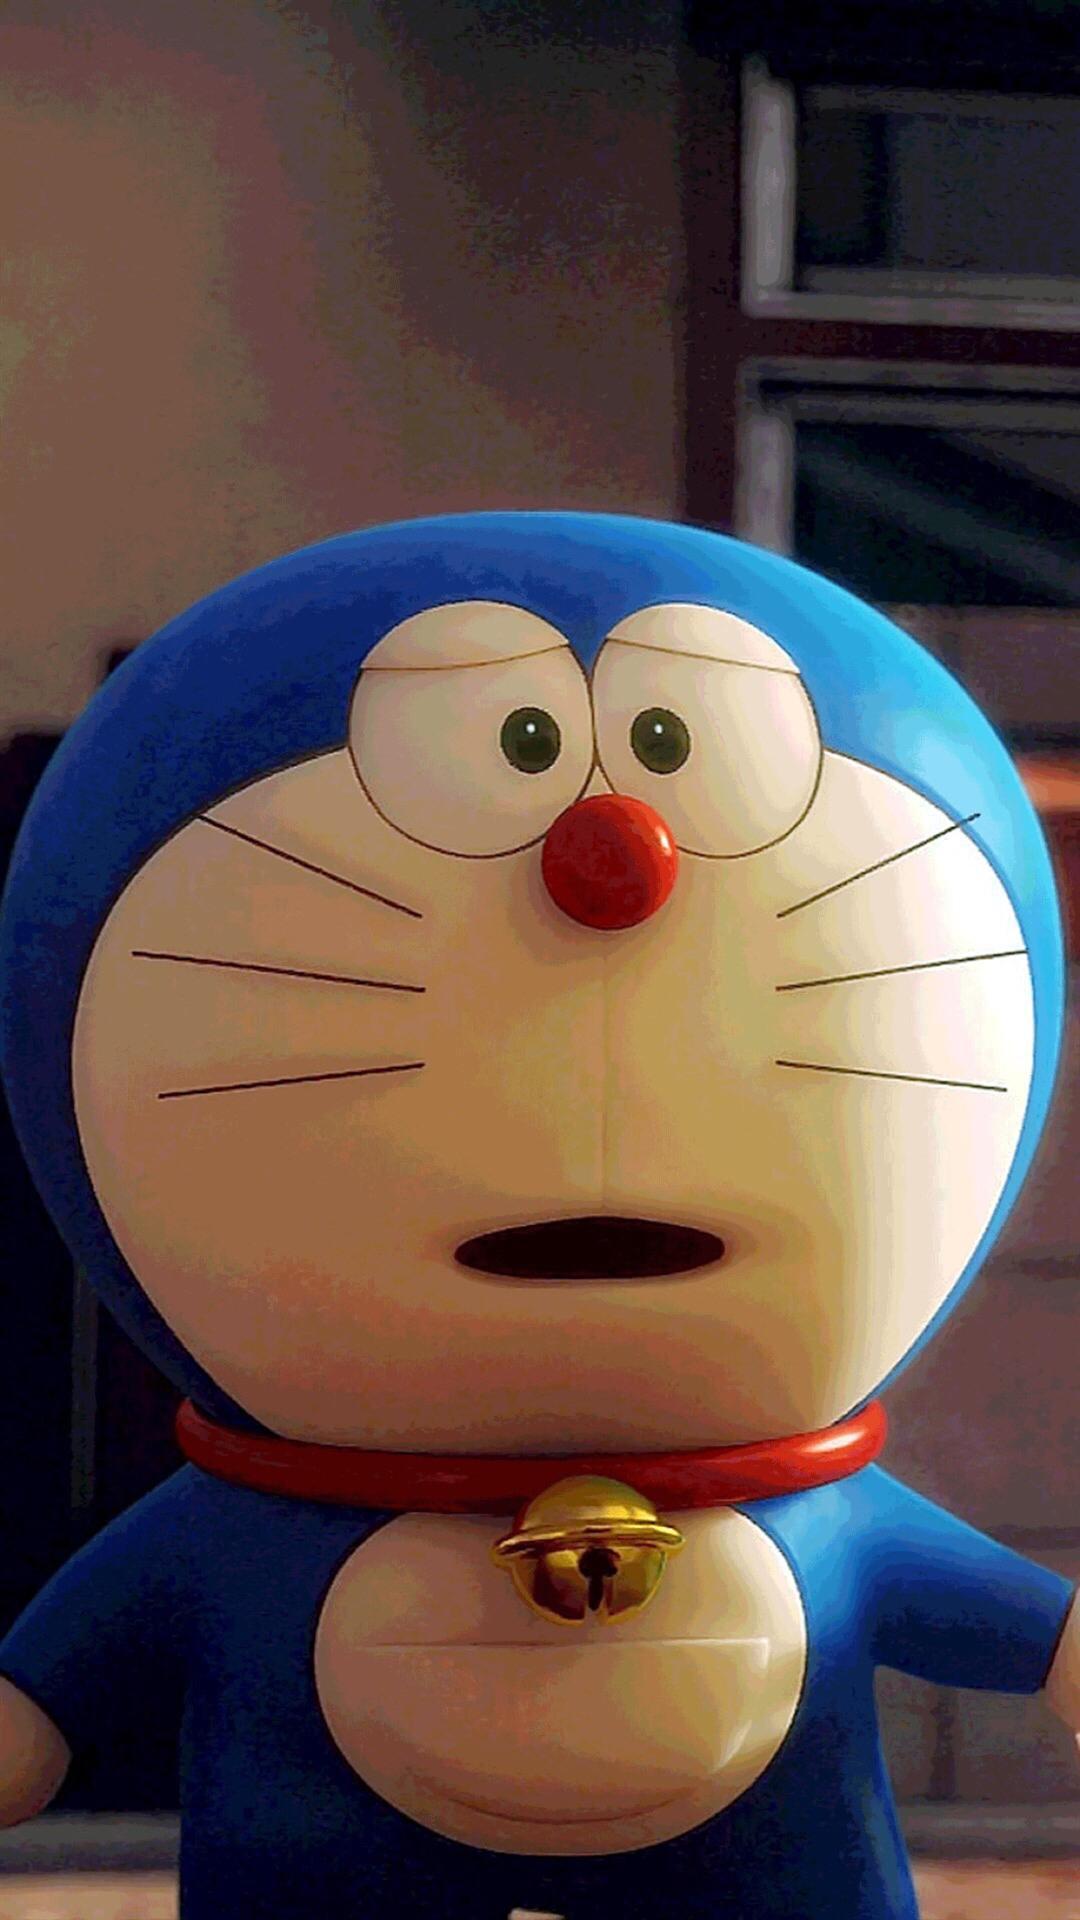 Doraemon HD iPhone X Wallpapers - Wallpaper Cave